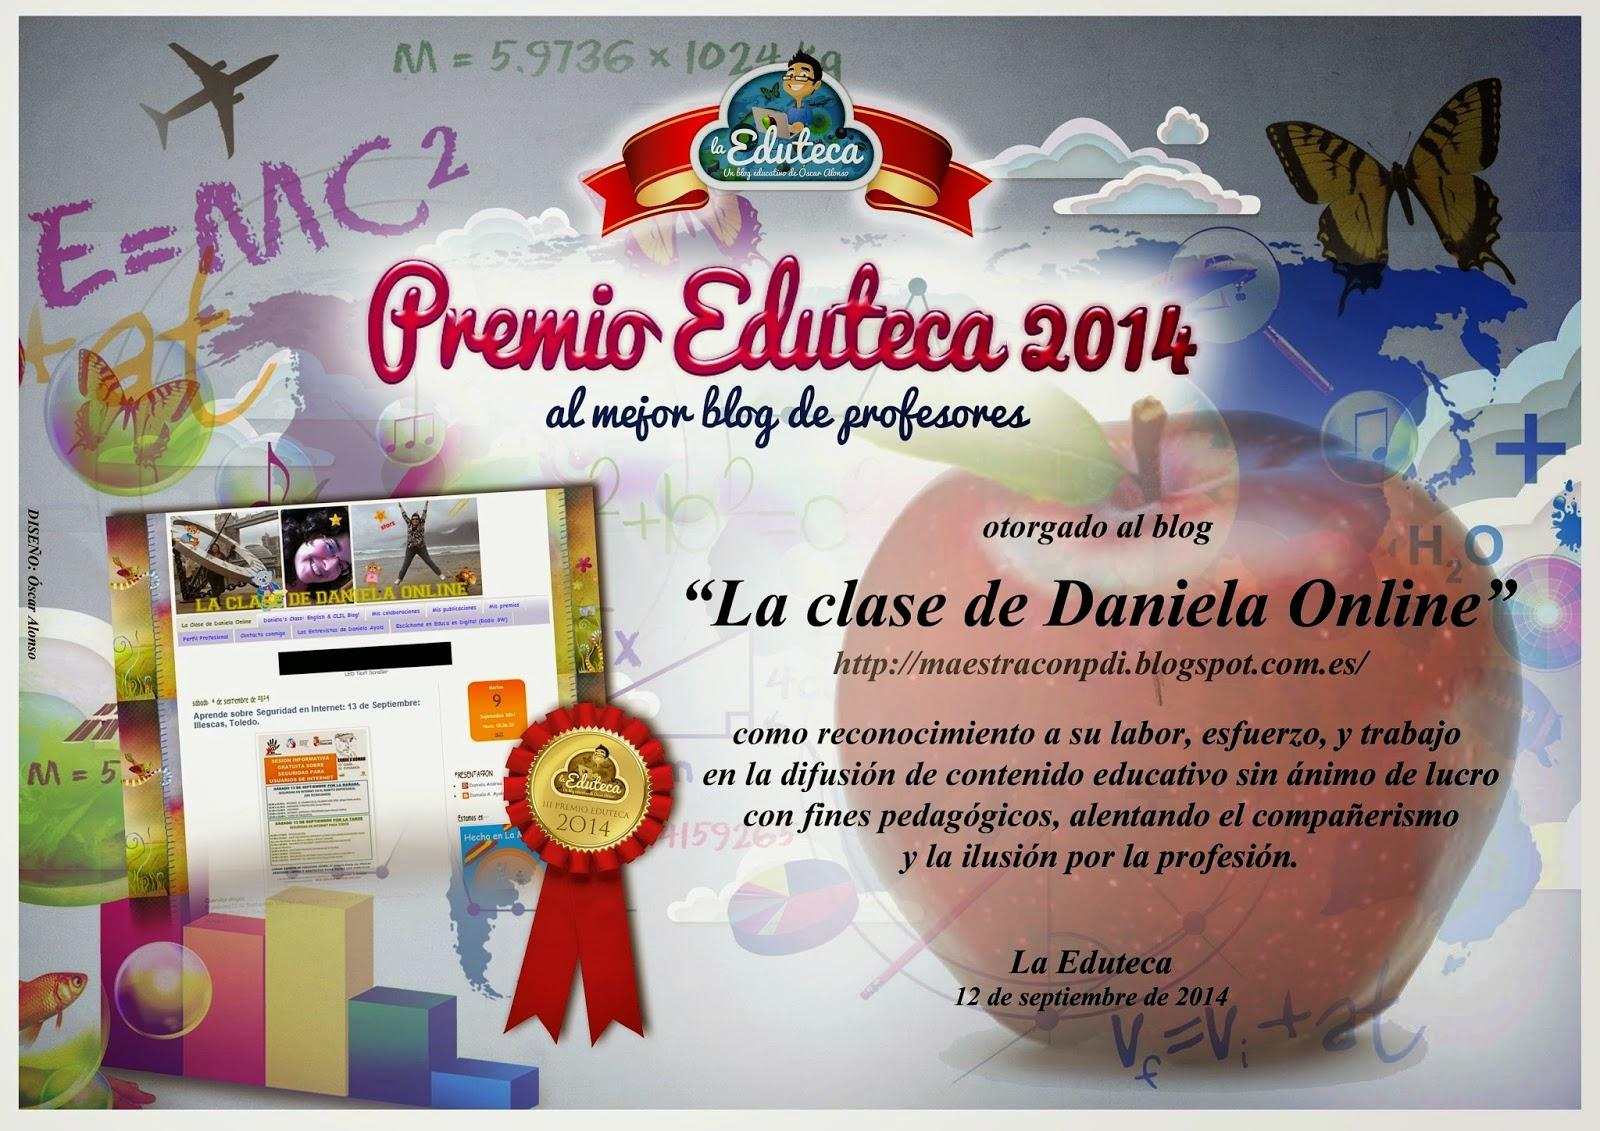 Mejor Blog de Profesores 2014